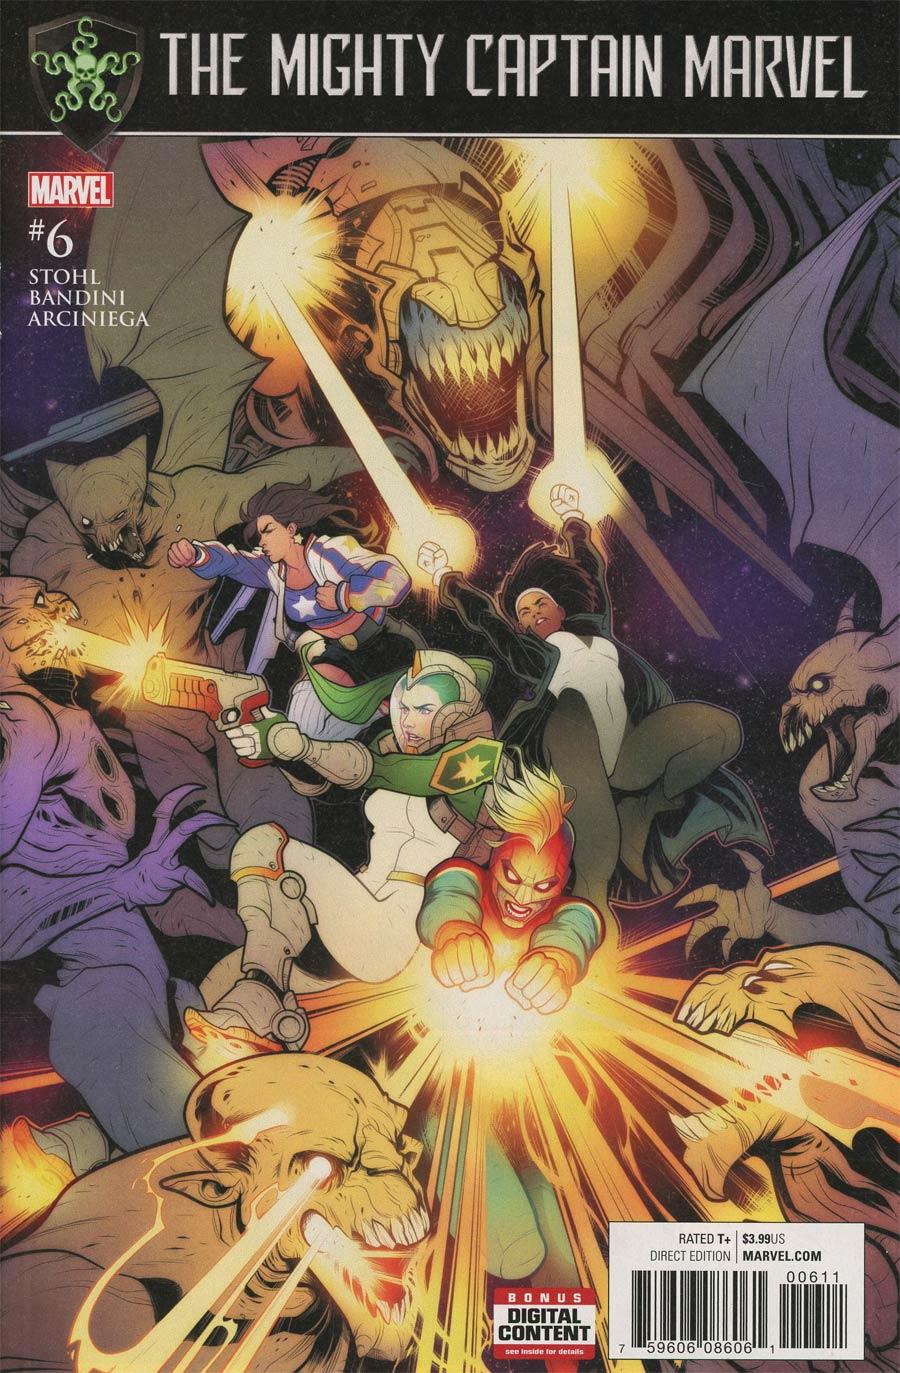 Mighty Captain Marvel #6 Cover A Regular Elizabeth Torque Cover (Secret Empire Tie-In)